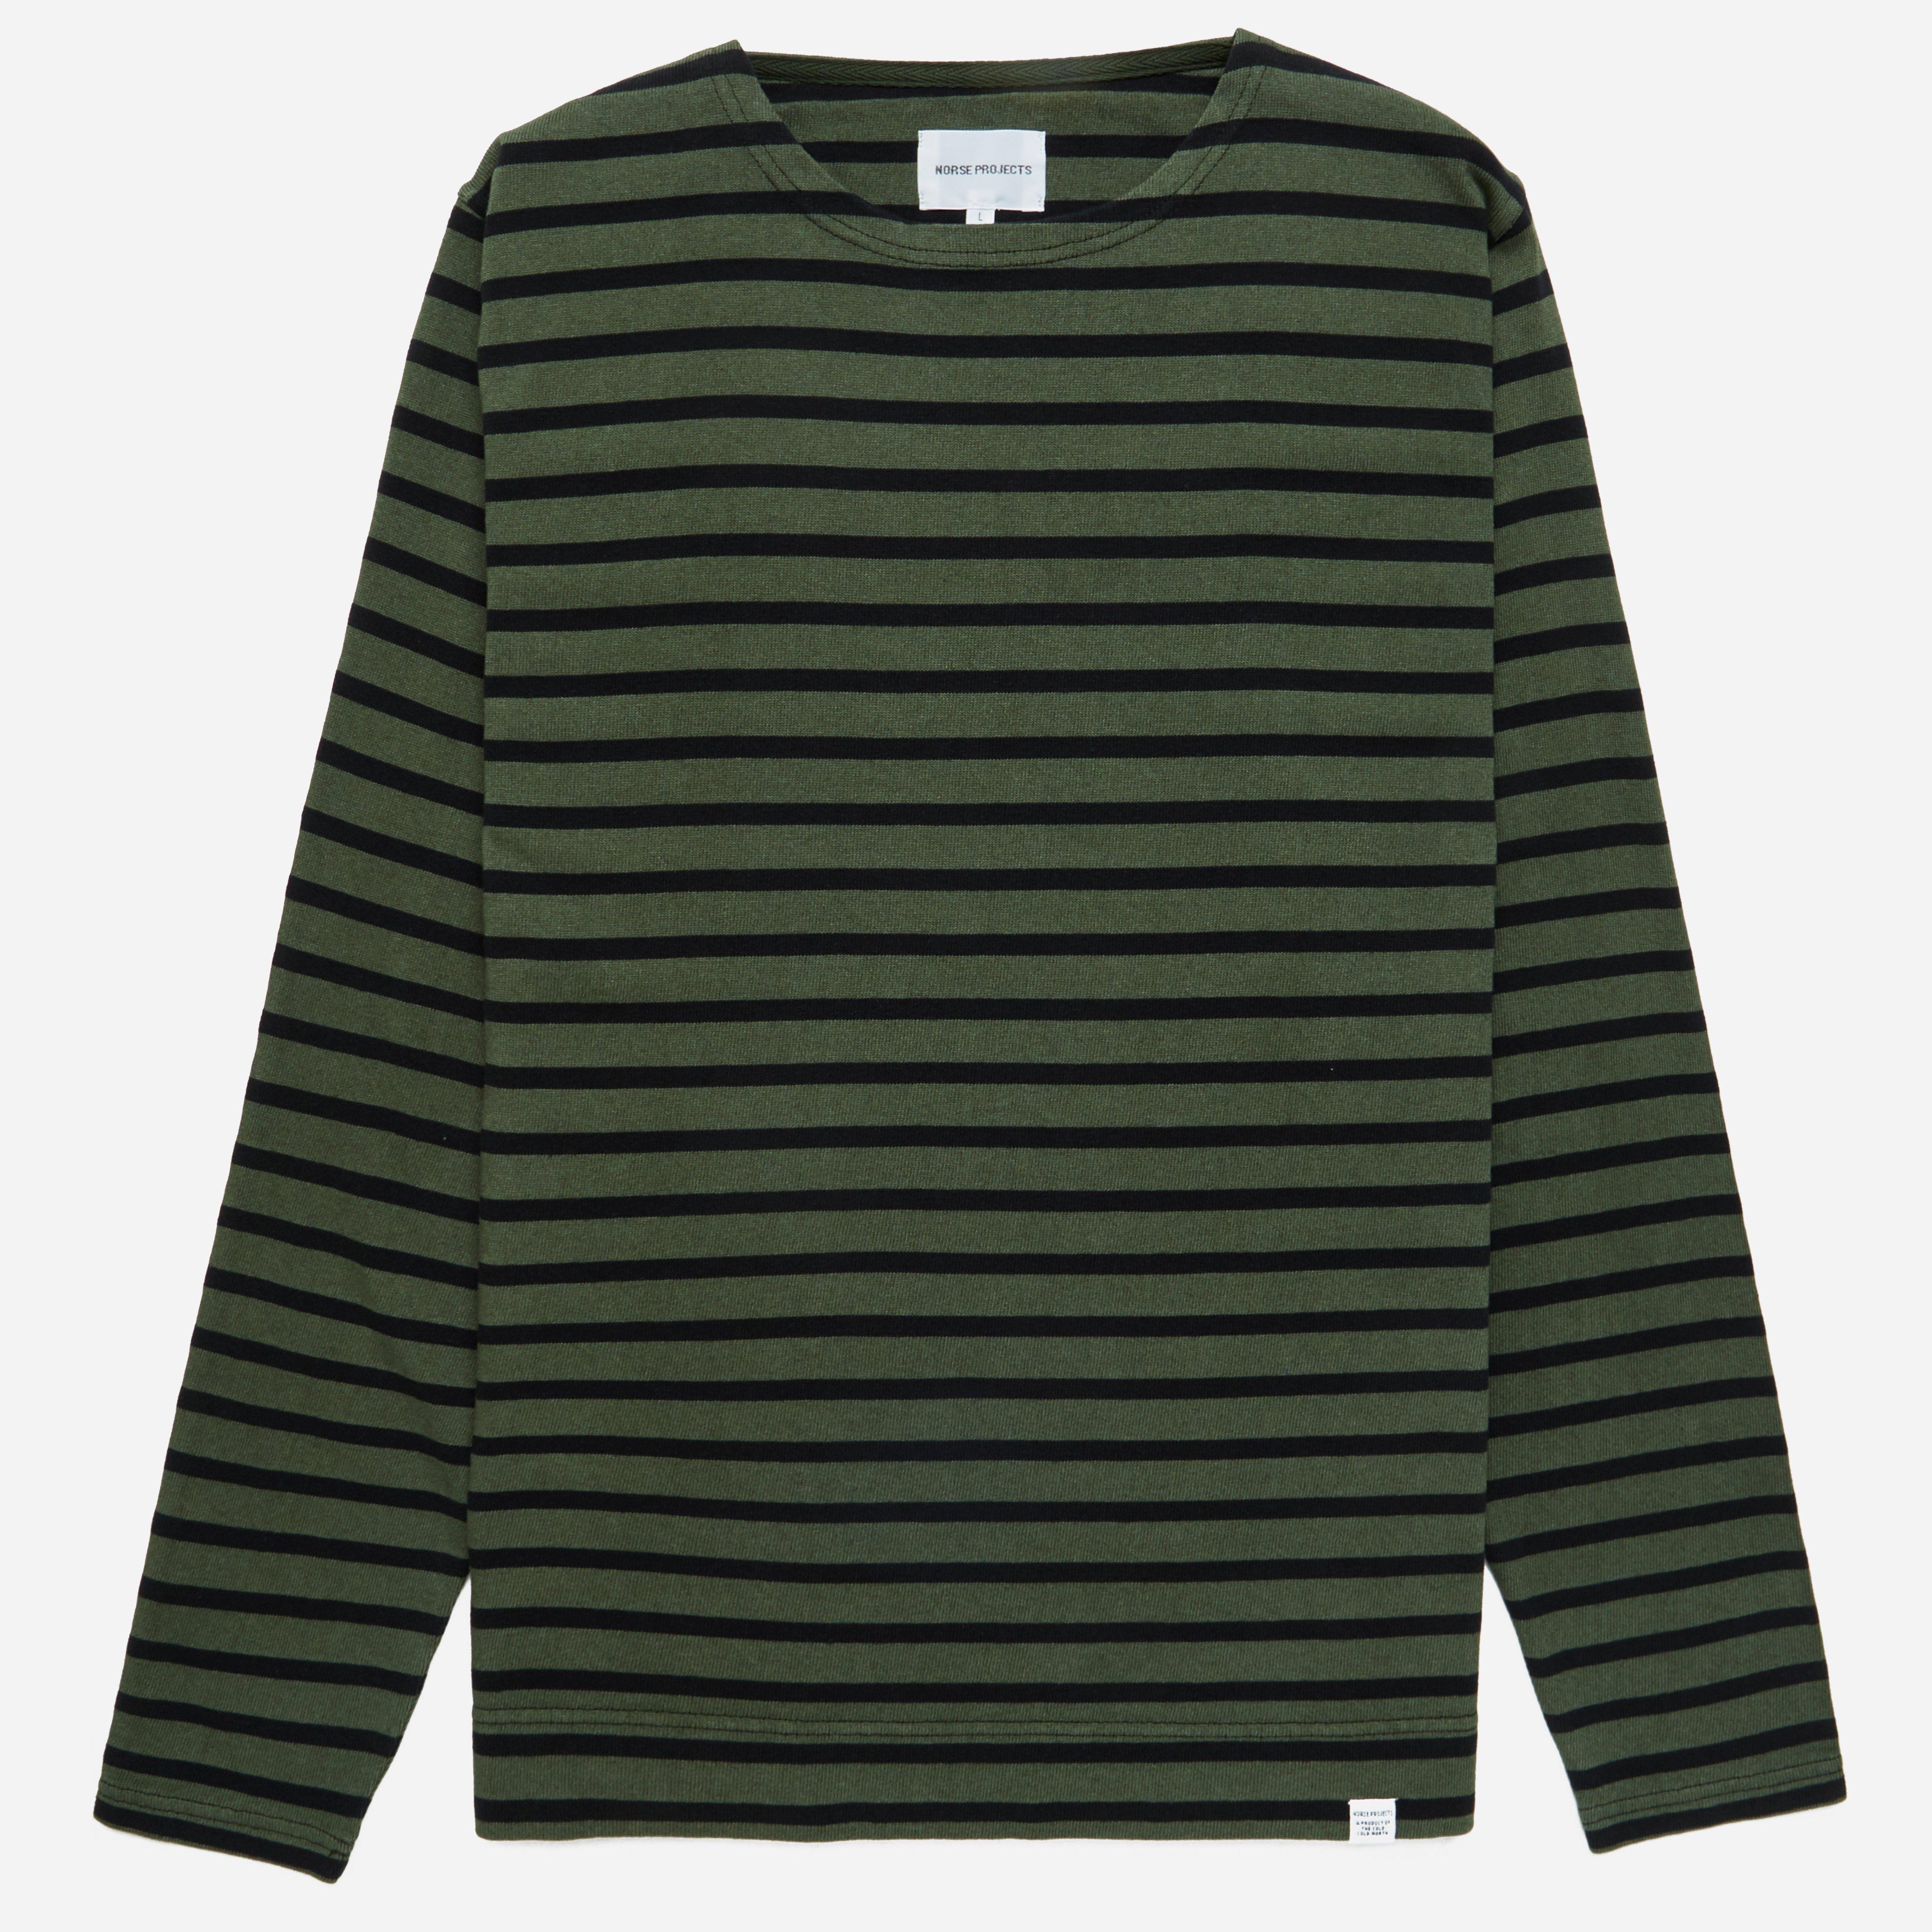 Norse Projects Godtfred Classic Compact Overdye Sweatshirt